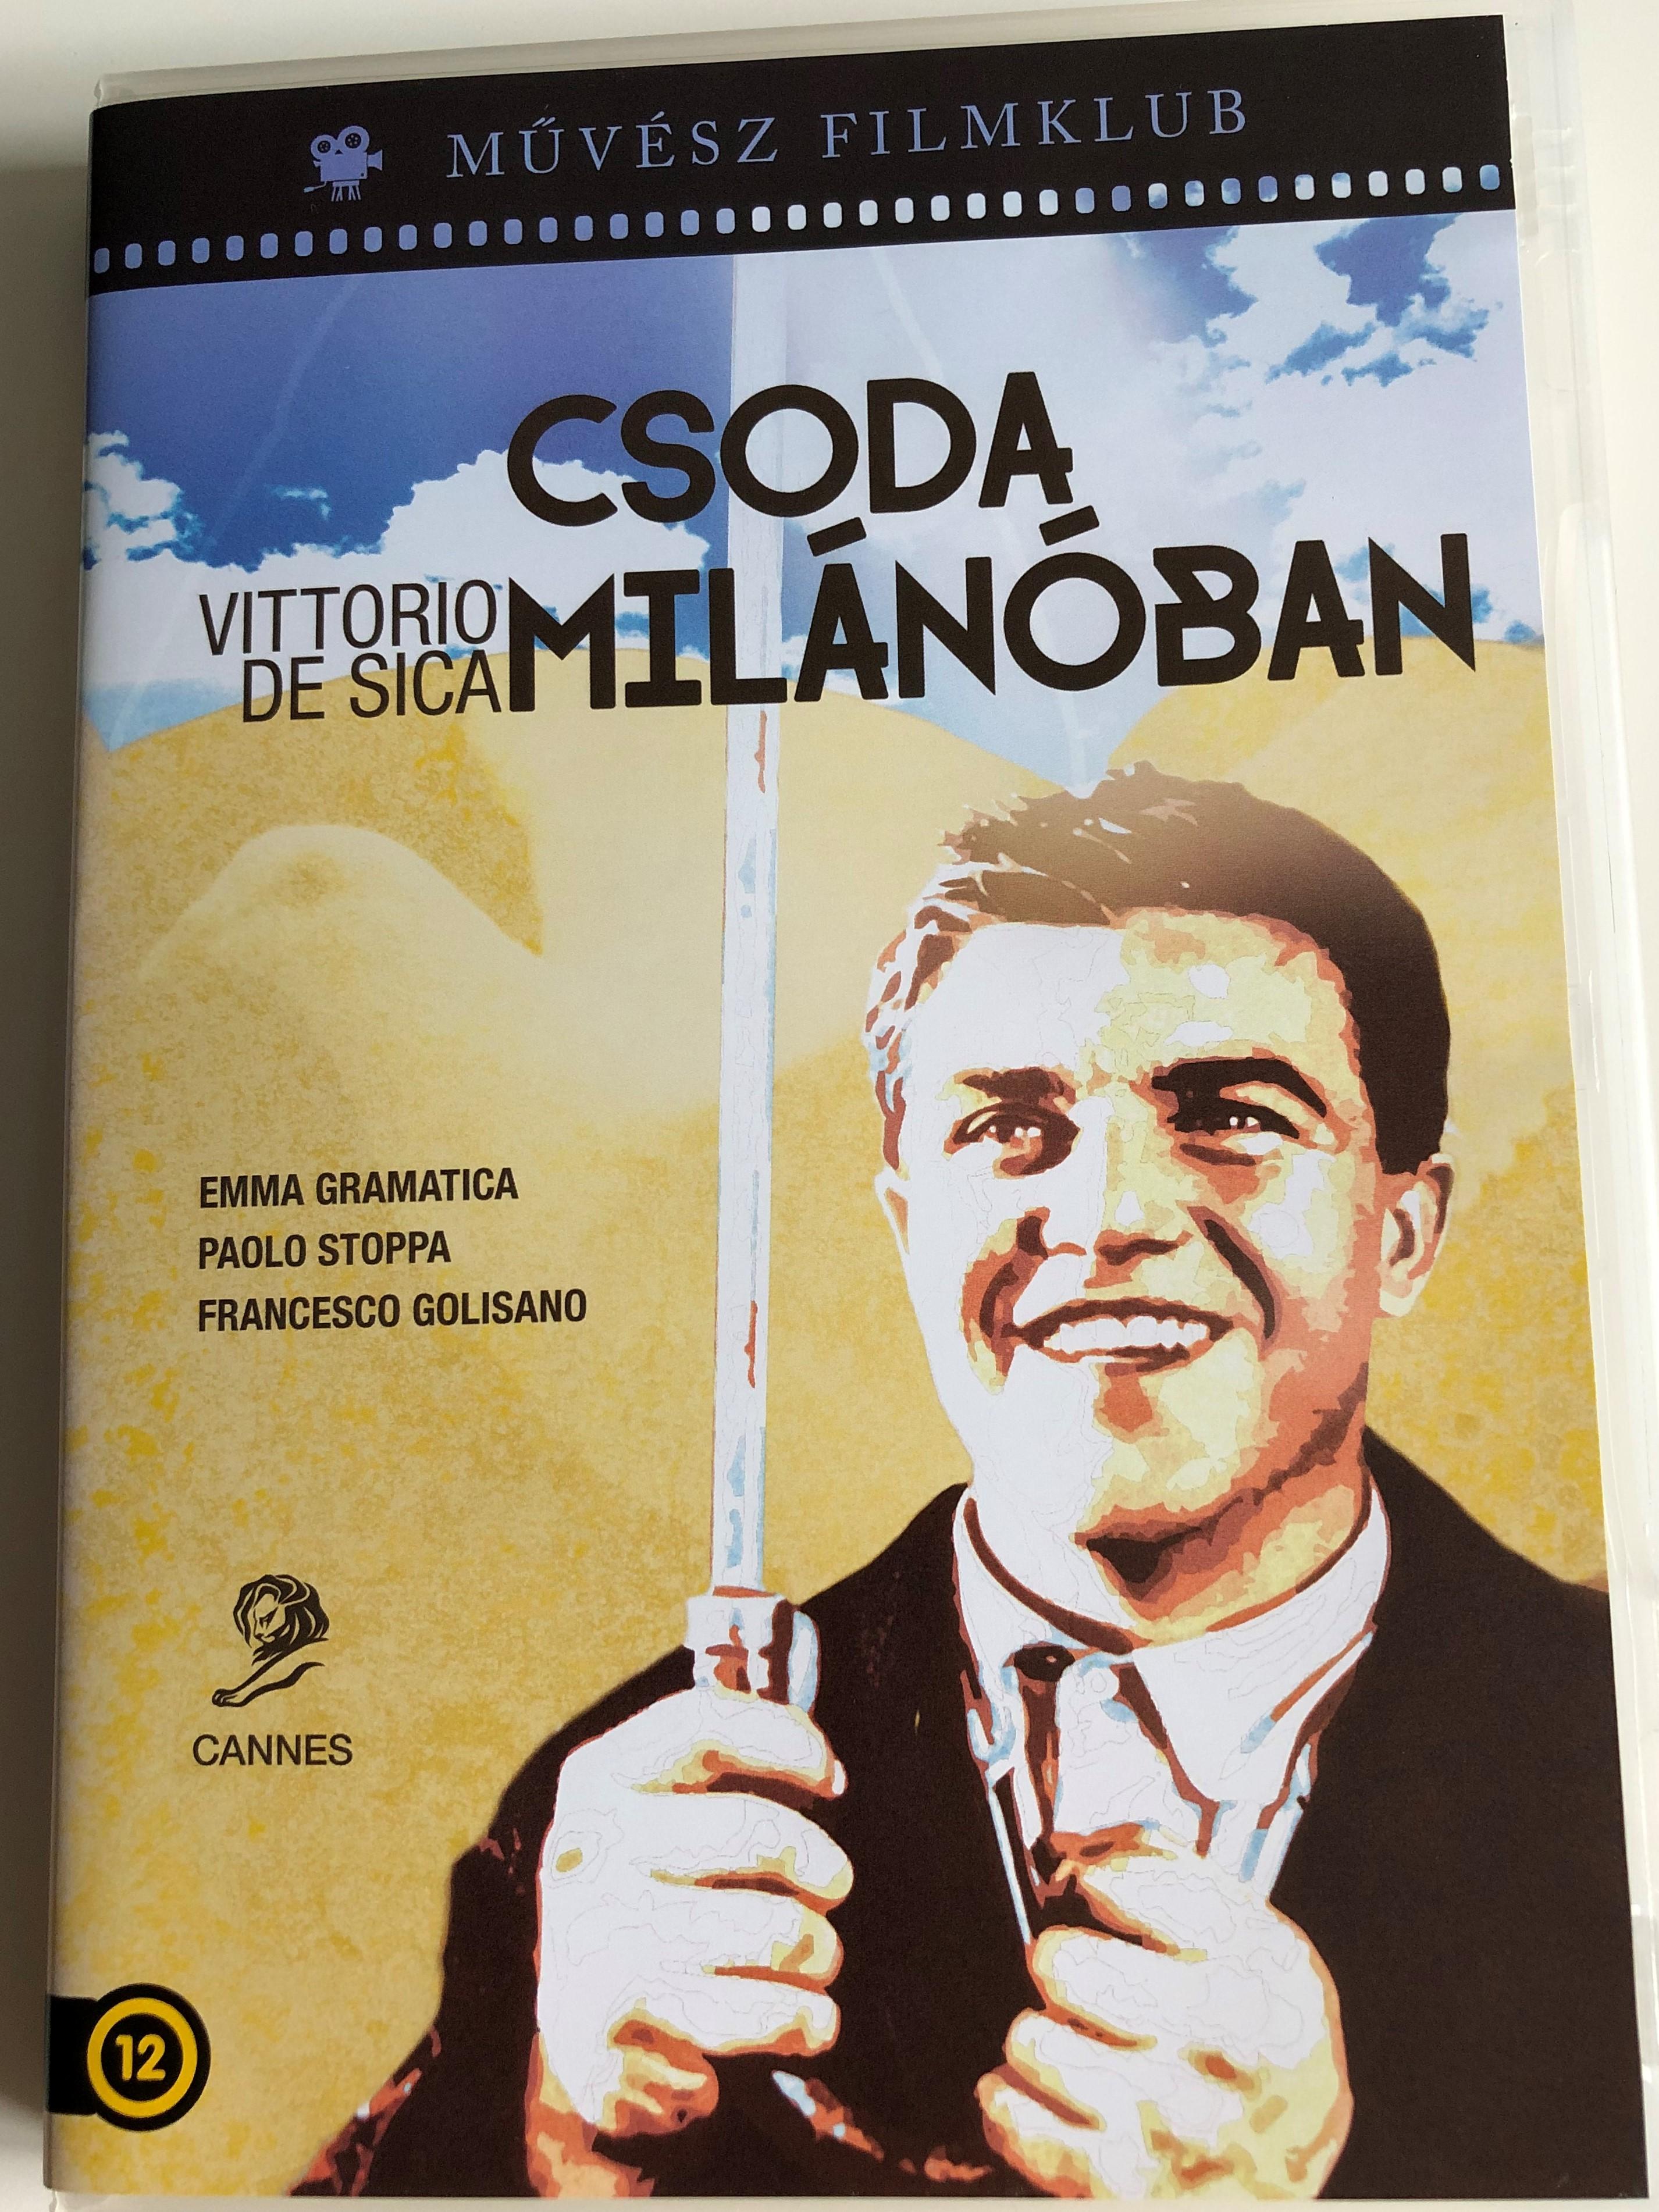 miracolo-a-milano-dvd-1951-csoda-mil-n-ban-miracle-in-milan-directed-by-vittorio-de-sica-starring-emma-gramatica-francesco-golisano-1-.jpg